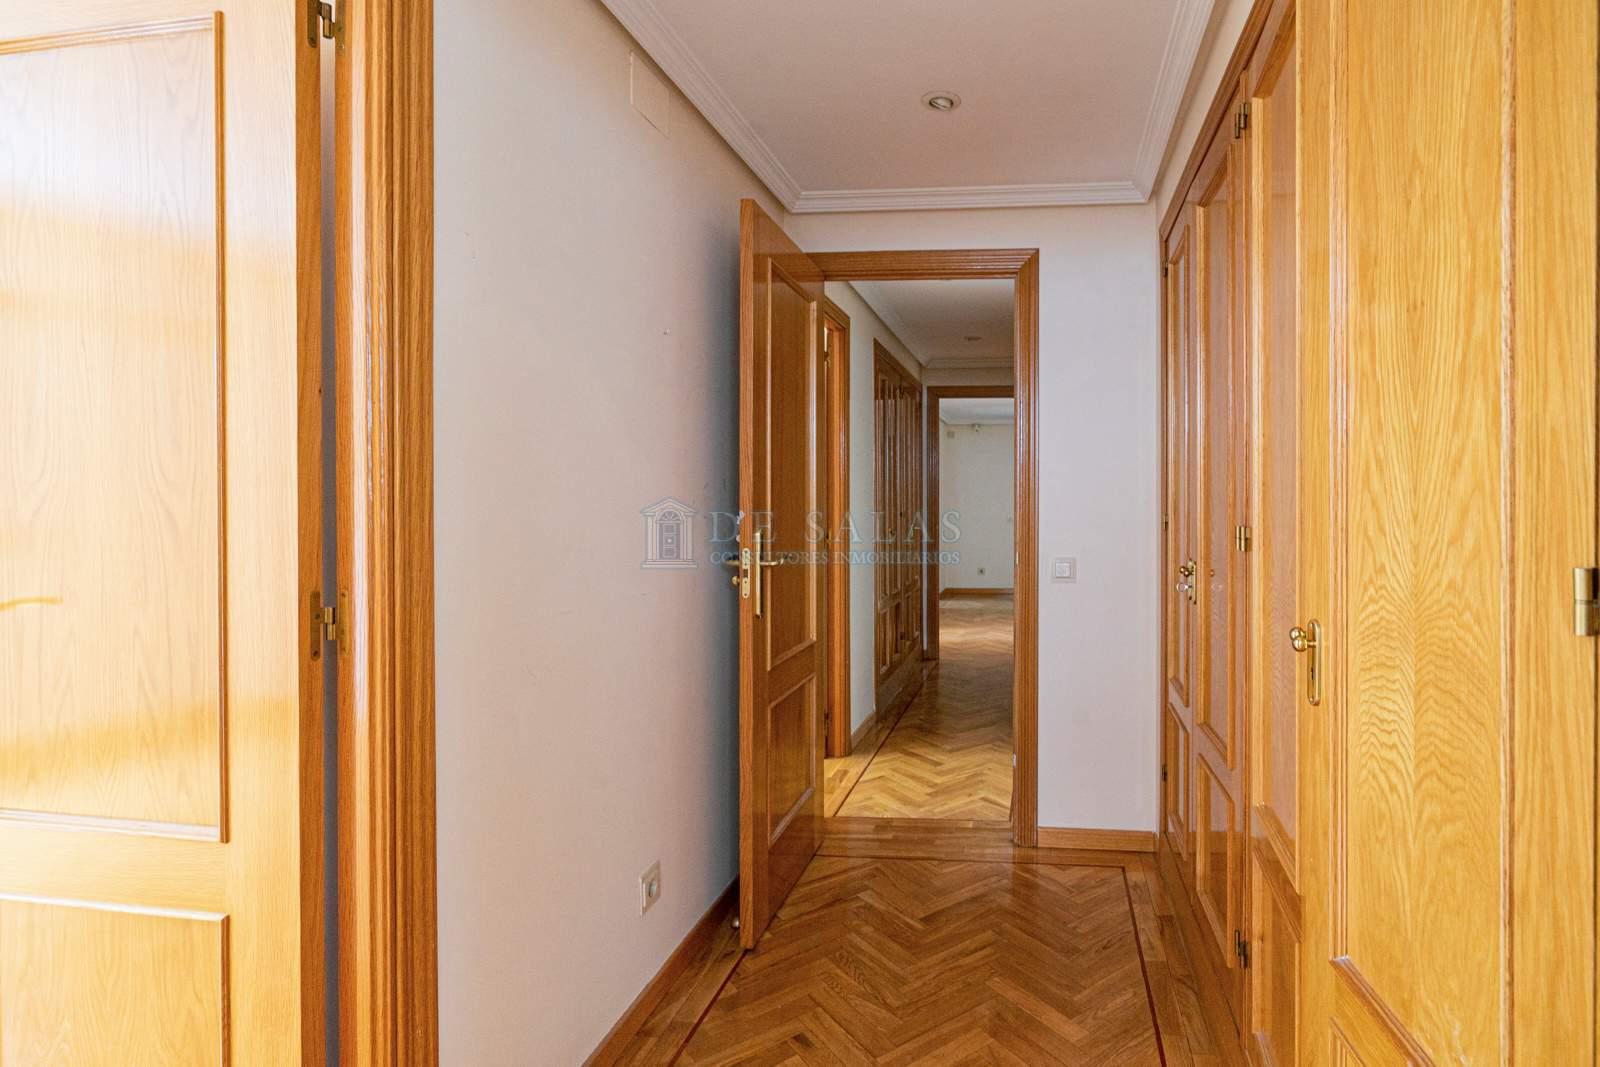 Dormitorio-0015